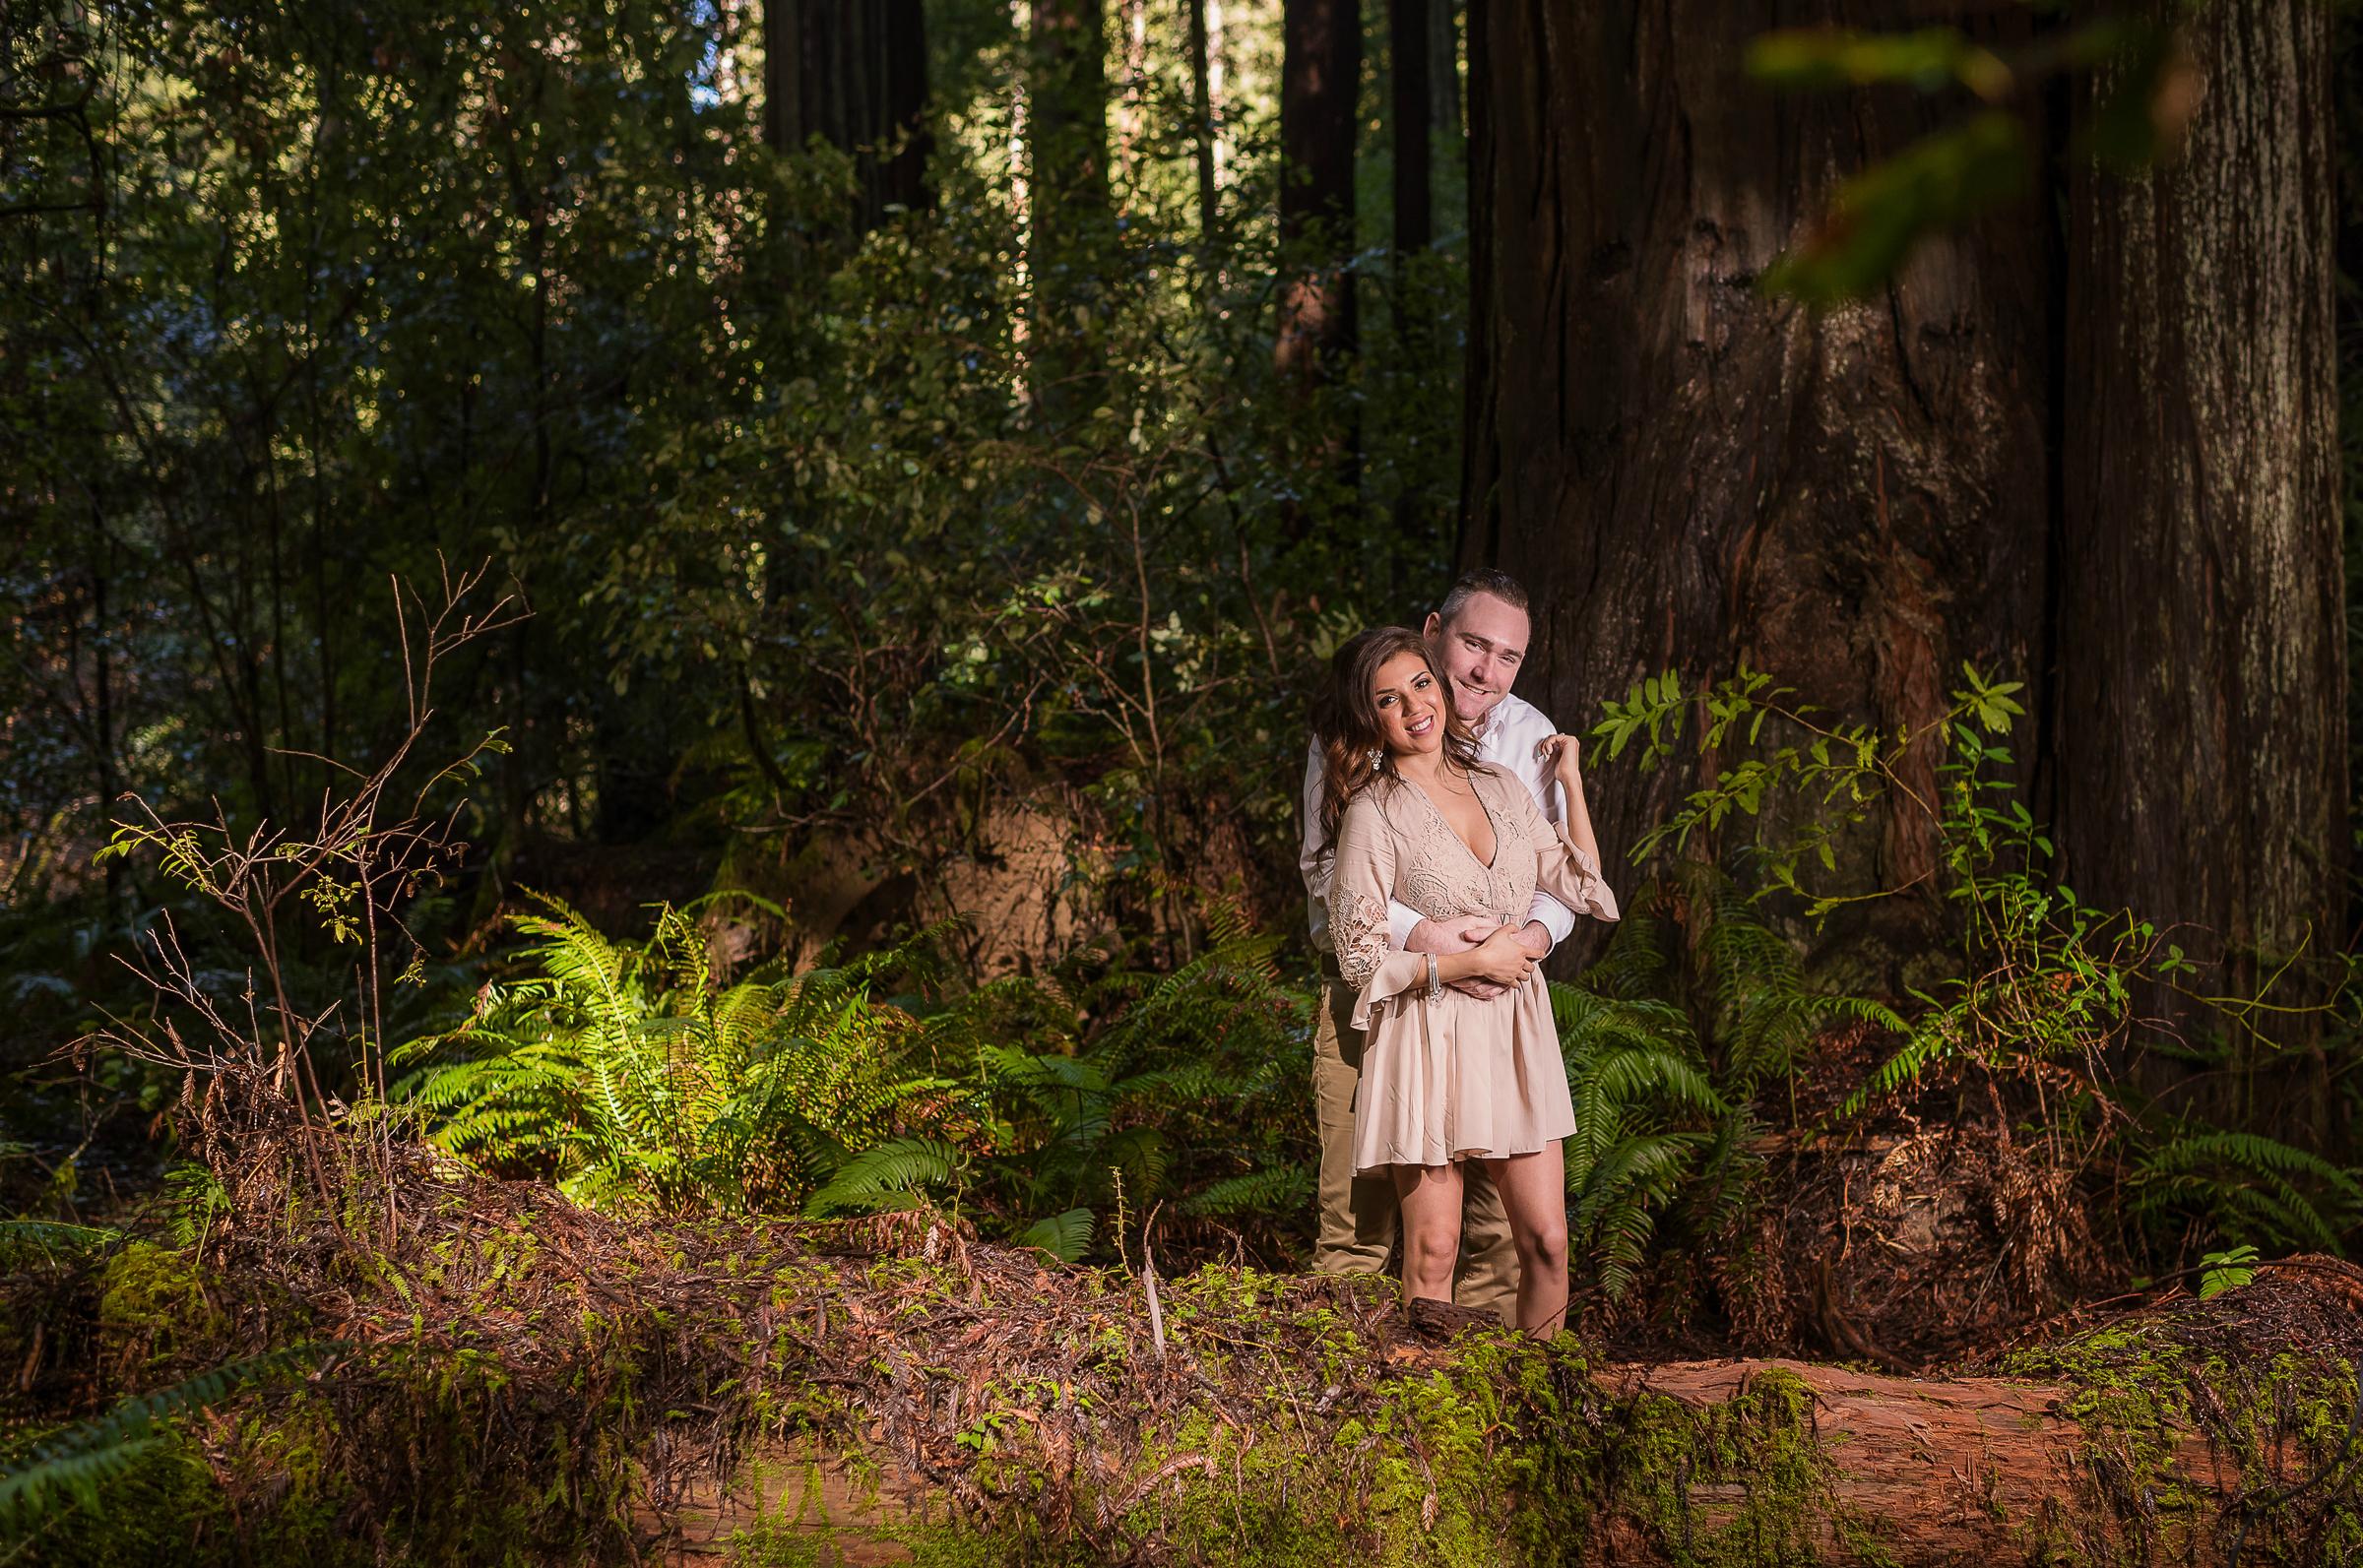 Chri&MaiHumboldtCountyEngagementRedwoods-26 - Copy.JPG